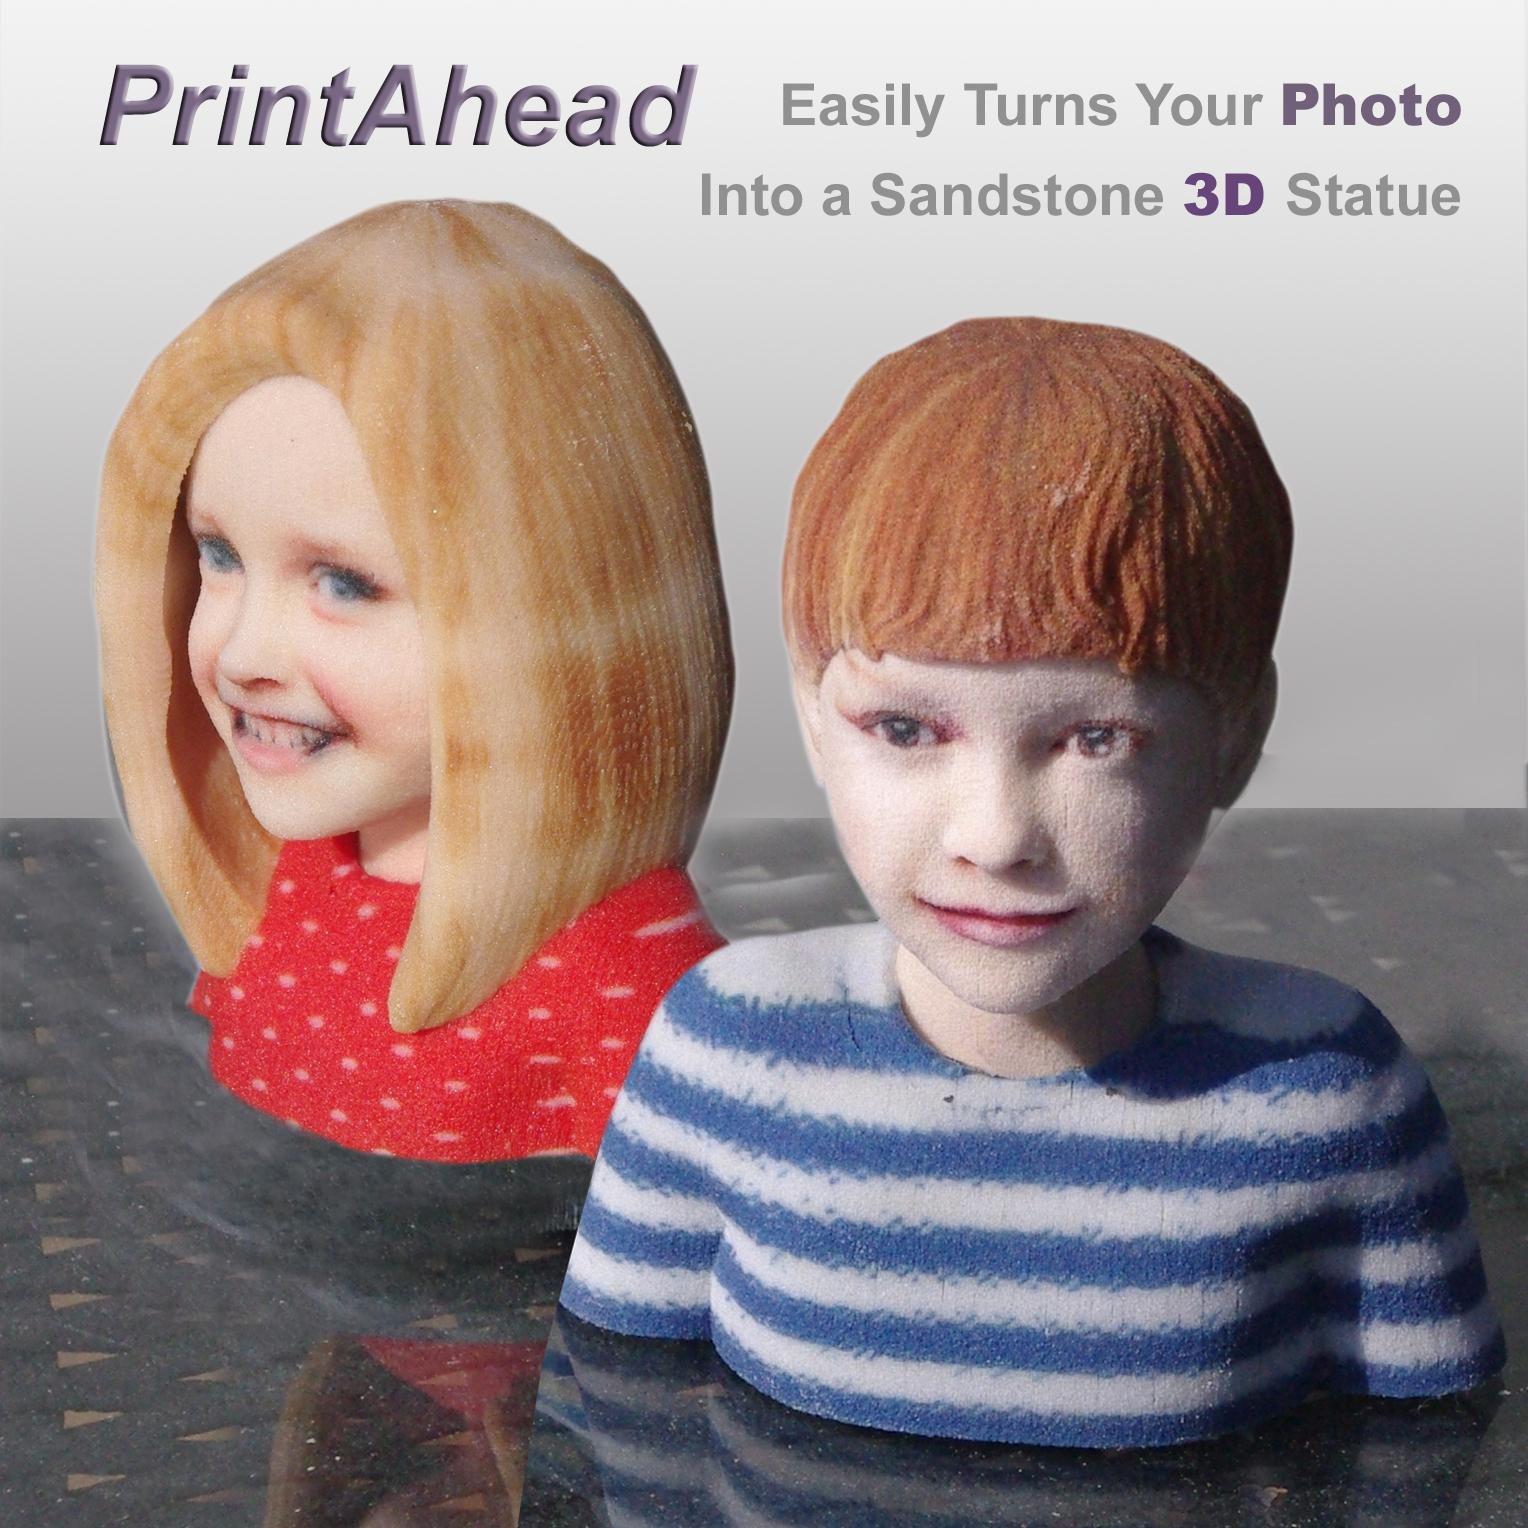 PrintAhead